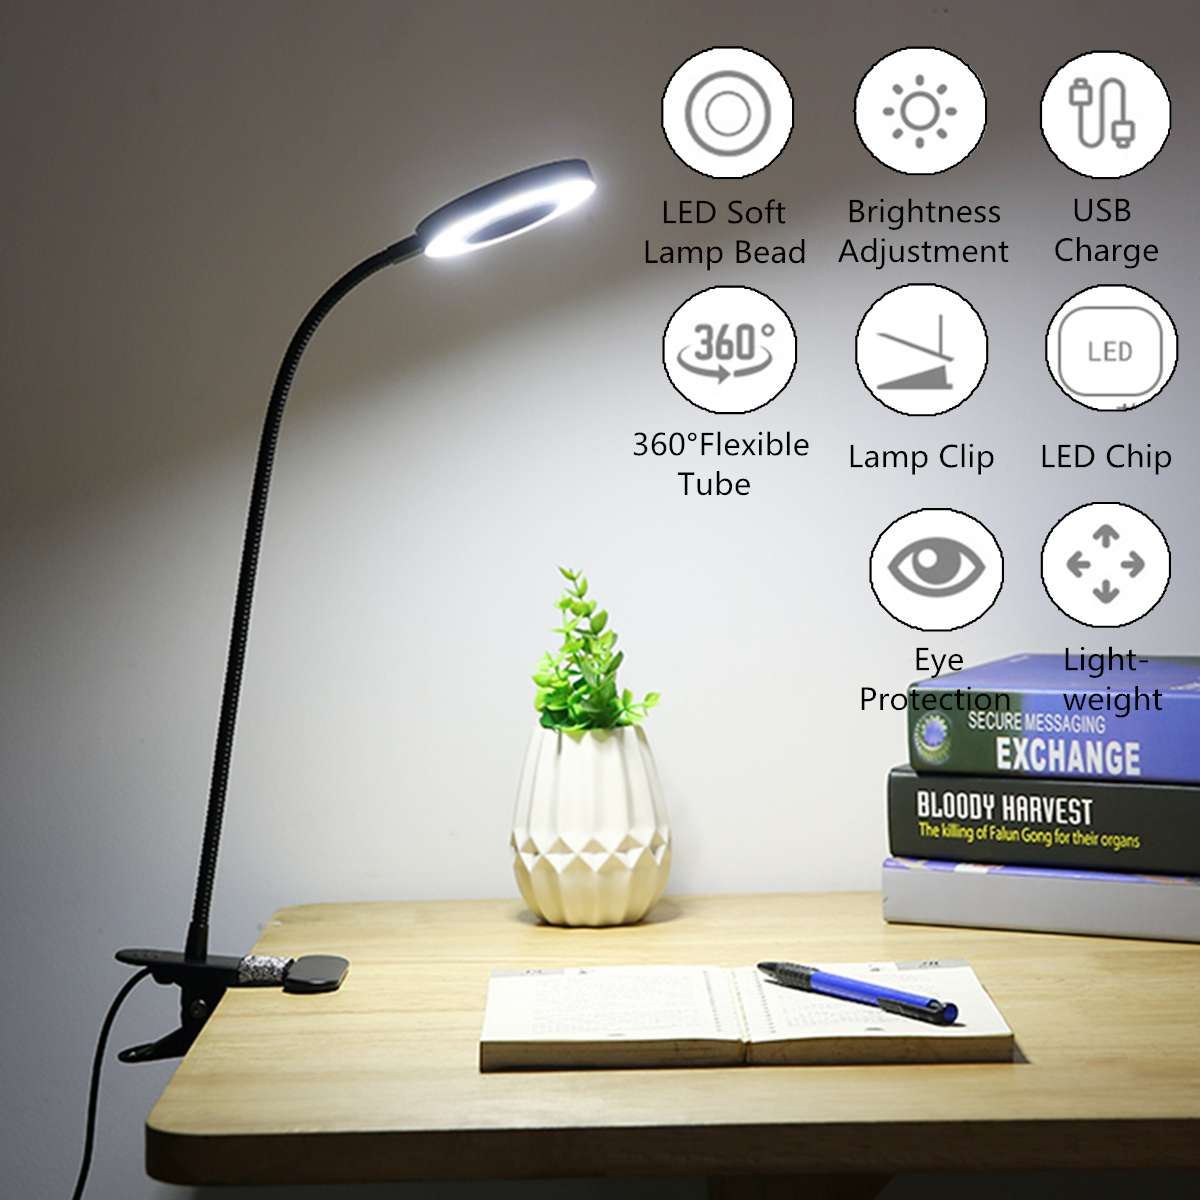 USB Power Clip Holder LED Book Light Desk Lamp 7W Flexible Bed Reading Book Lights Table Lamp for Study Room Eye Care Night Lamp